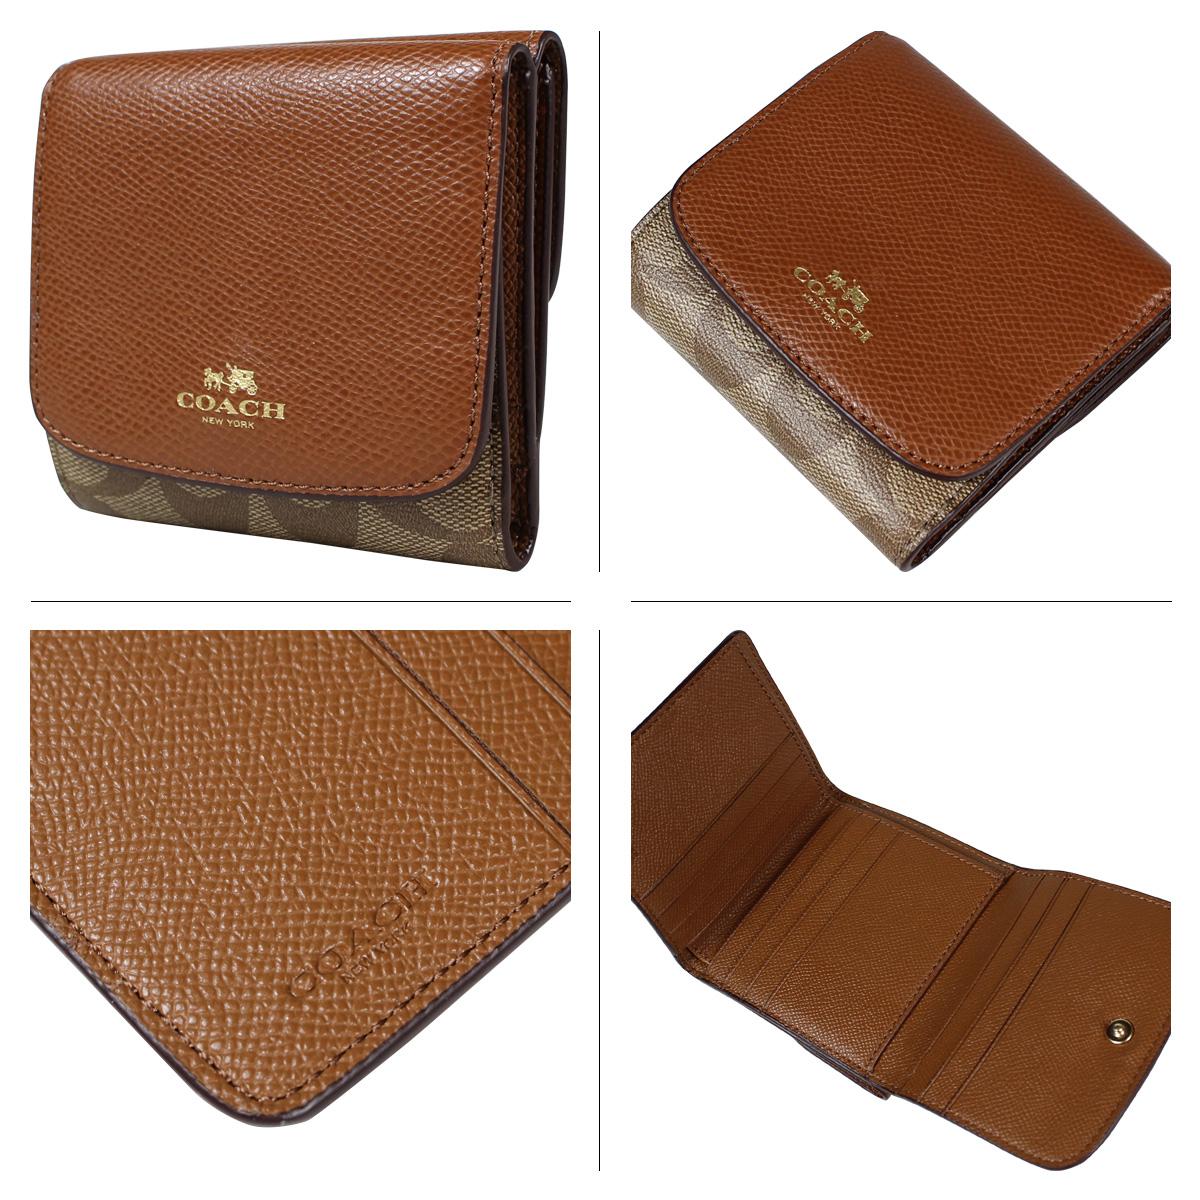 21812a4f4287 ... sport calf black leather wallet 150 bb295 301de  store coach coach  wallet tri fold wallet f53837 khaki saddle ladies 98756 e6be8